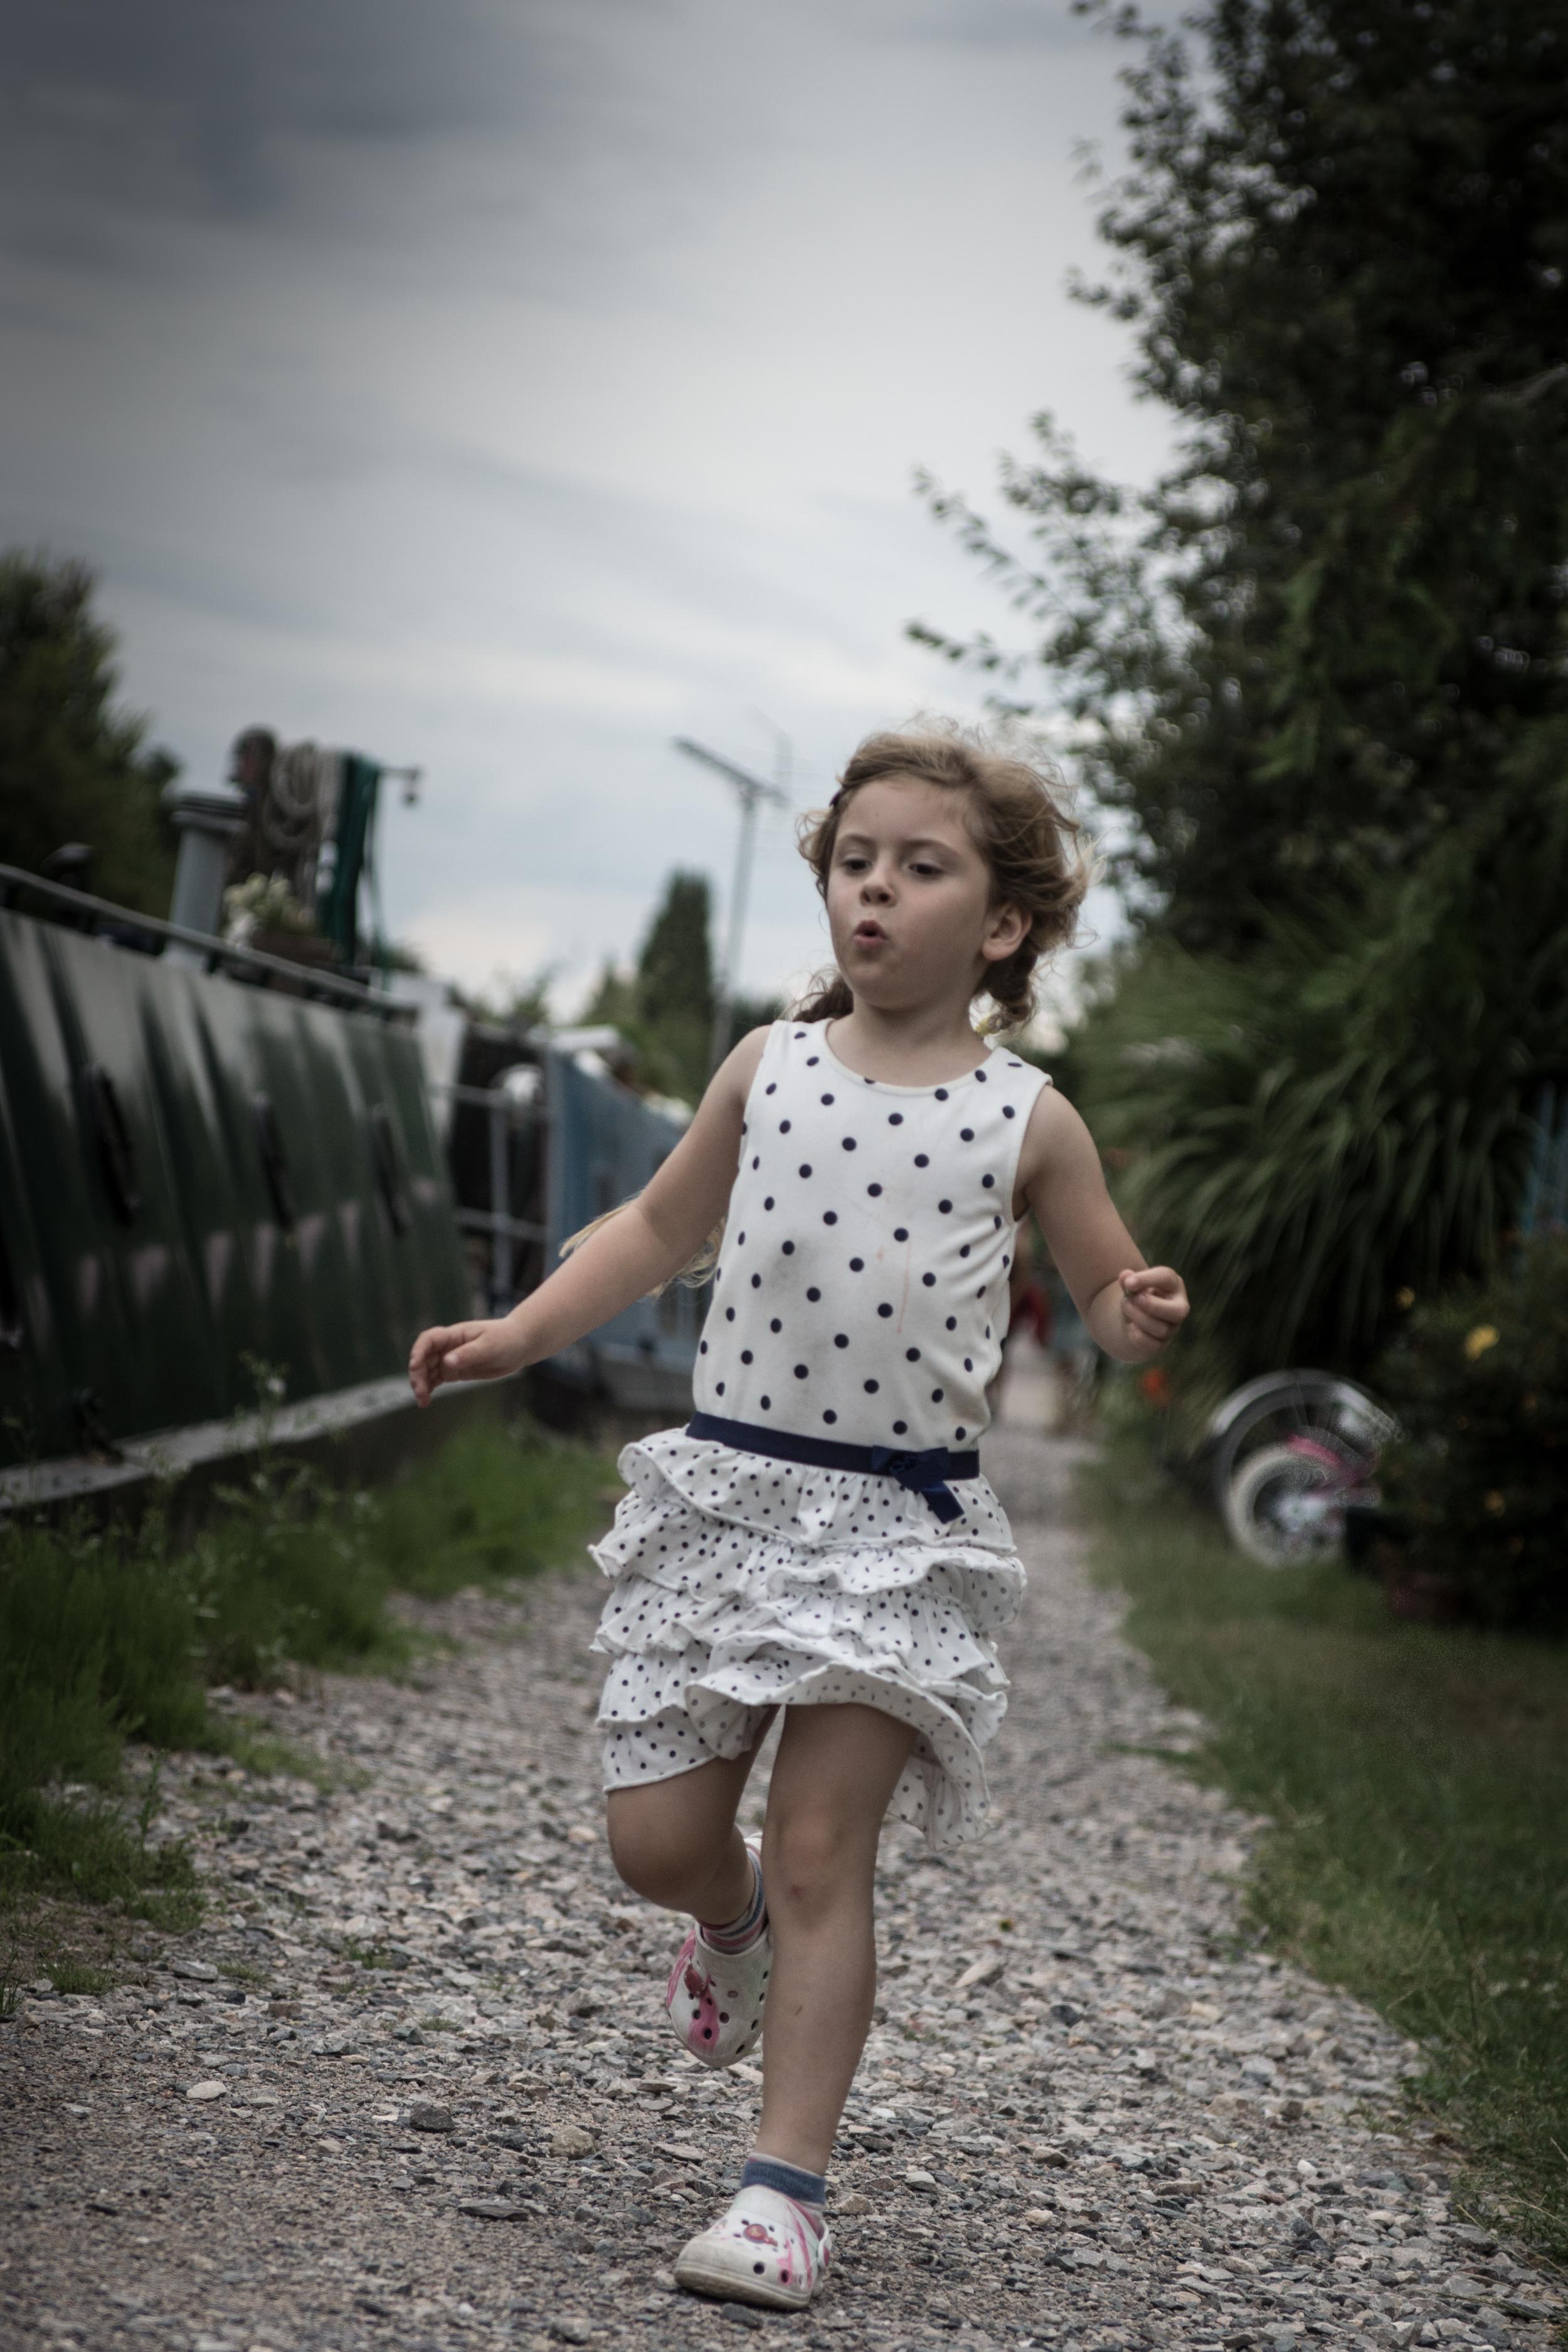 girl running on path-05660.jpg